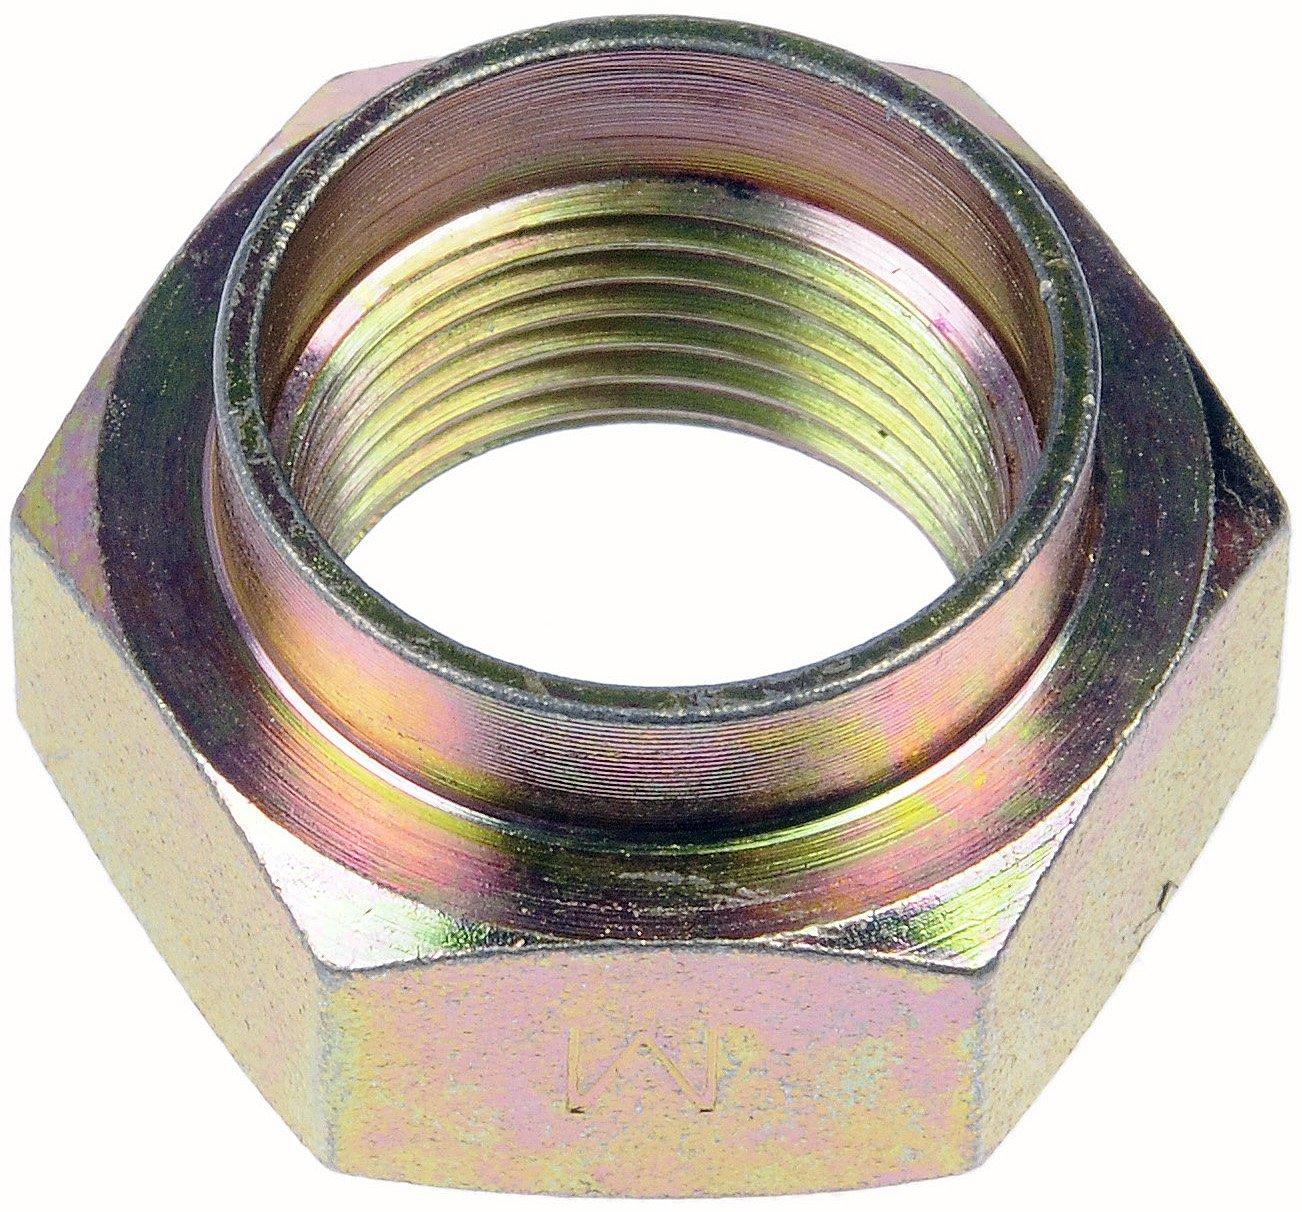 Dorman 05176 Spindle Lock Nut Kit